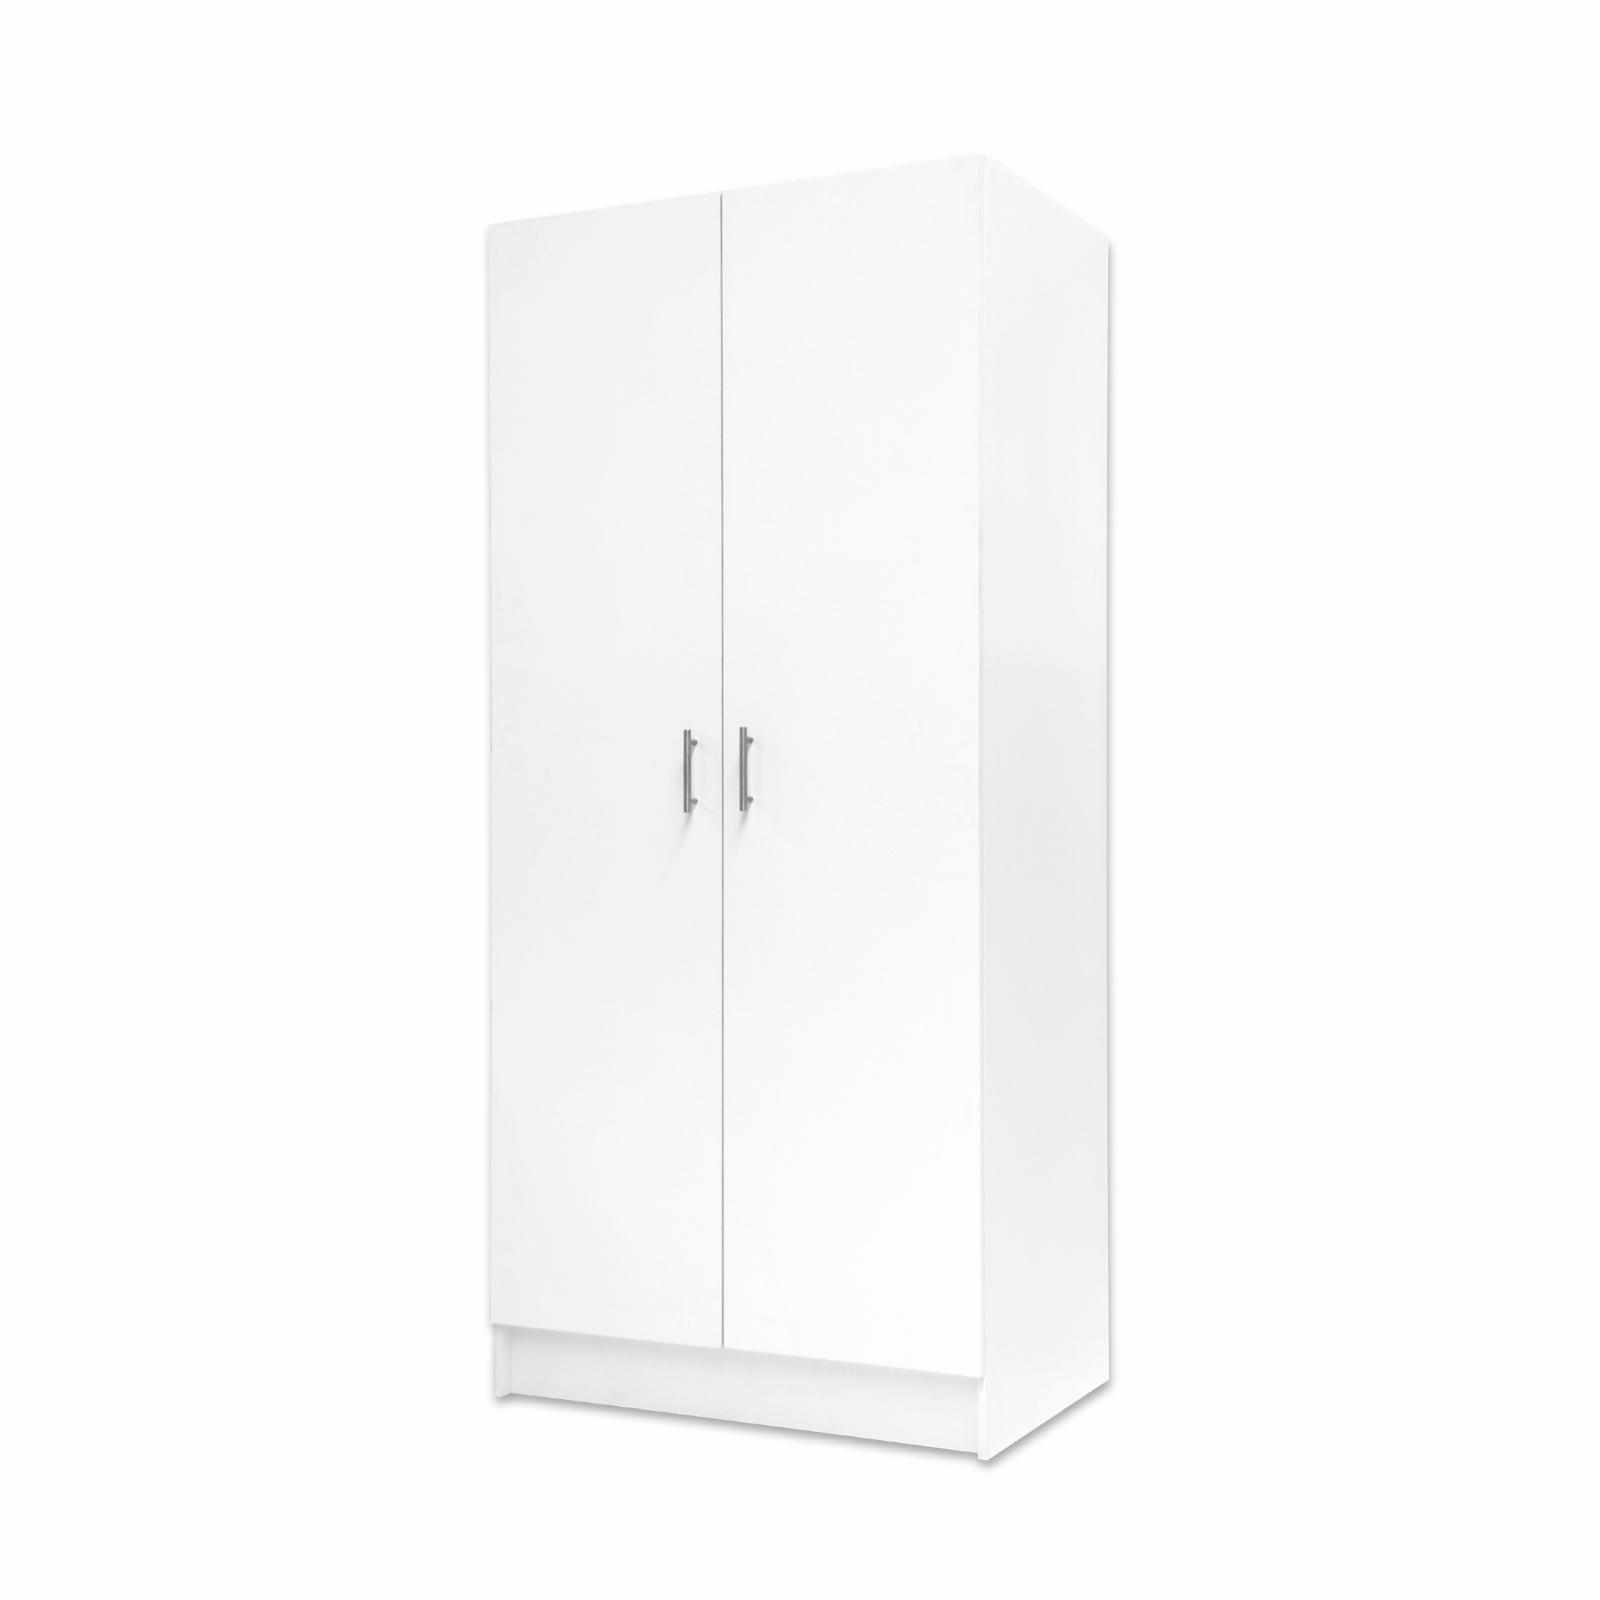 Bedford 900mm White 2 Door Tall High Moisture Resistant Split Cabinet